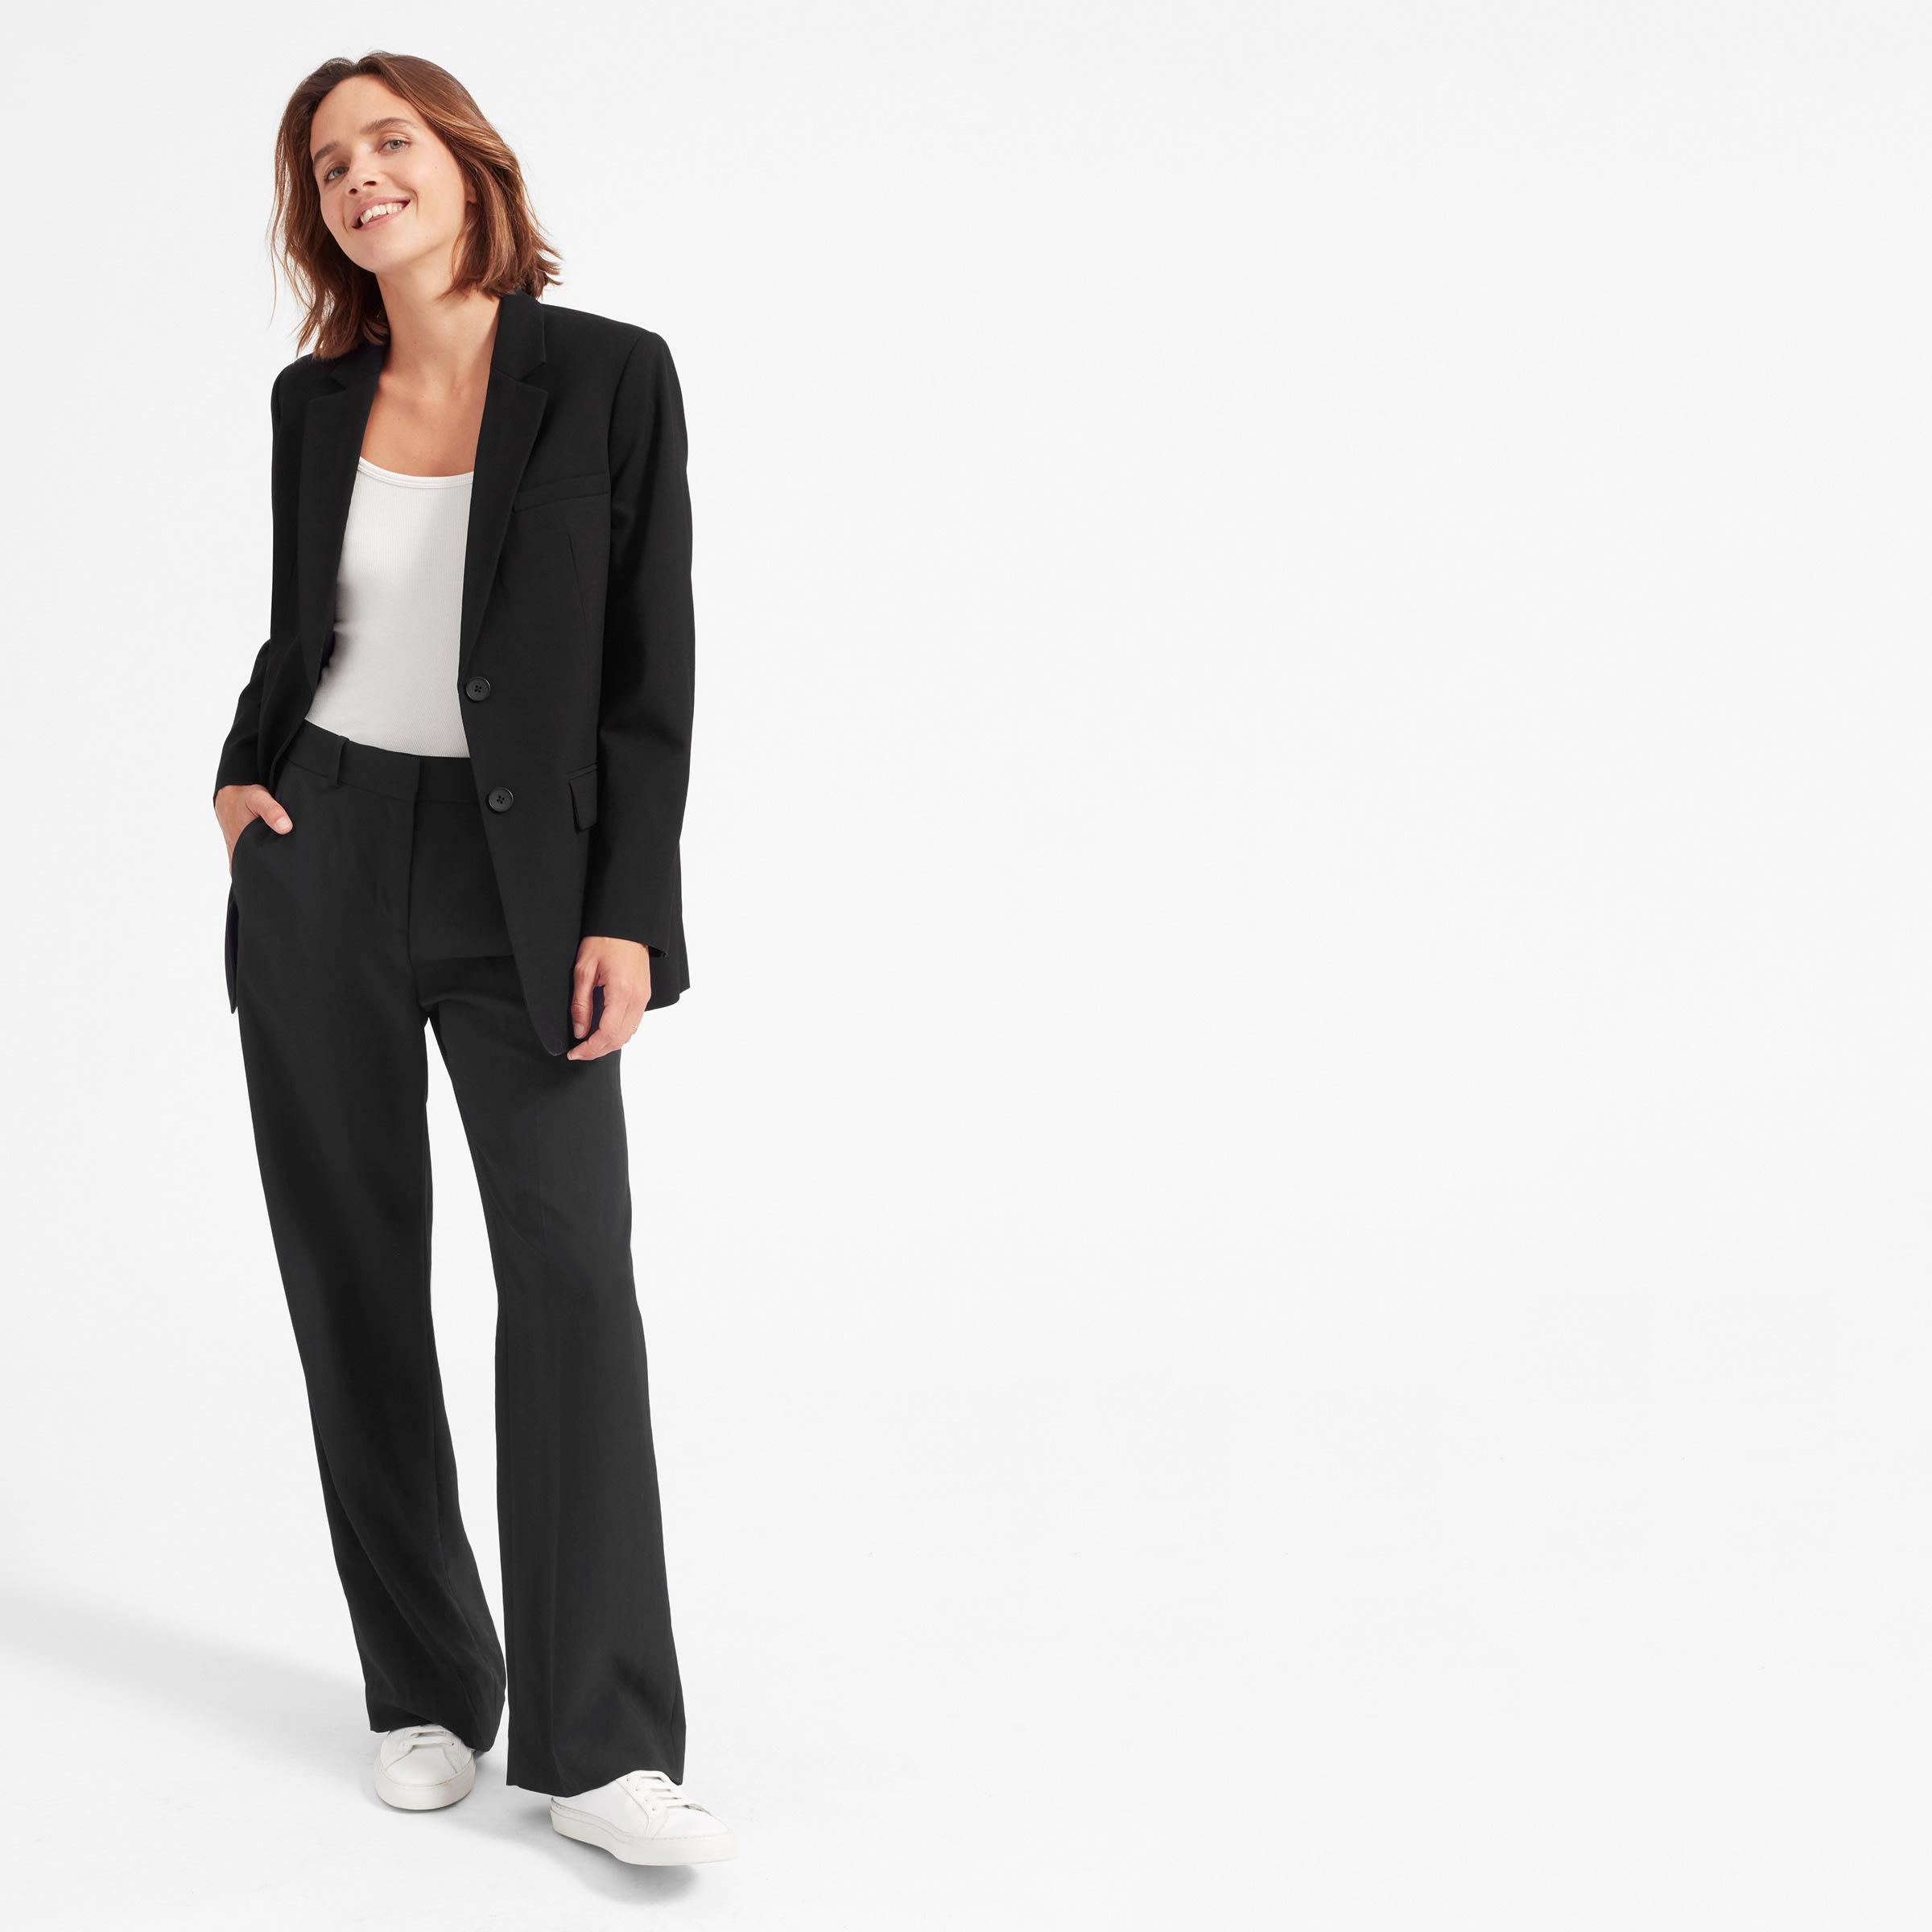 blazer_parisian_officewear.jpg